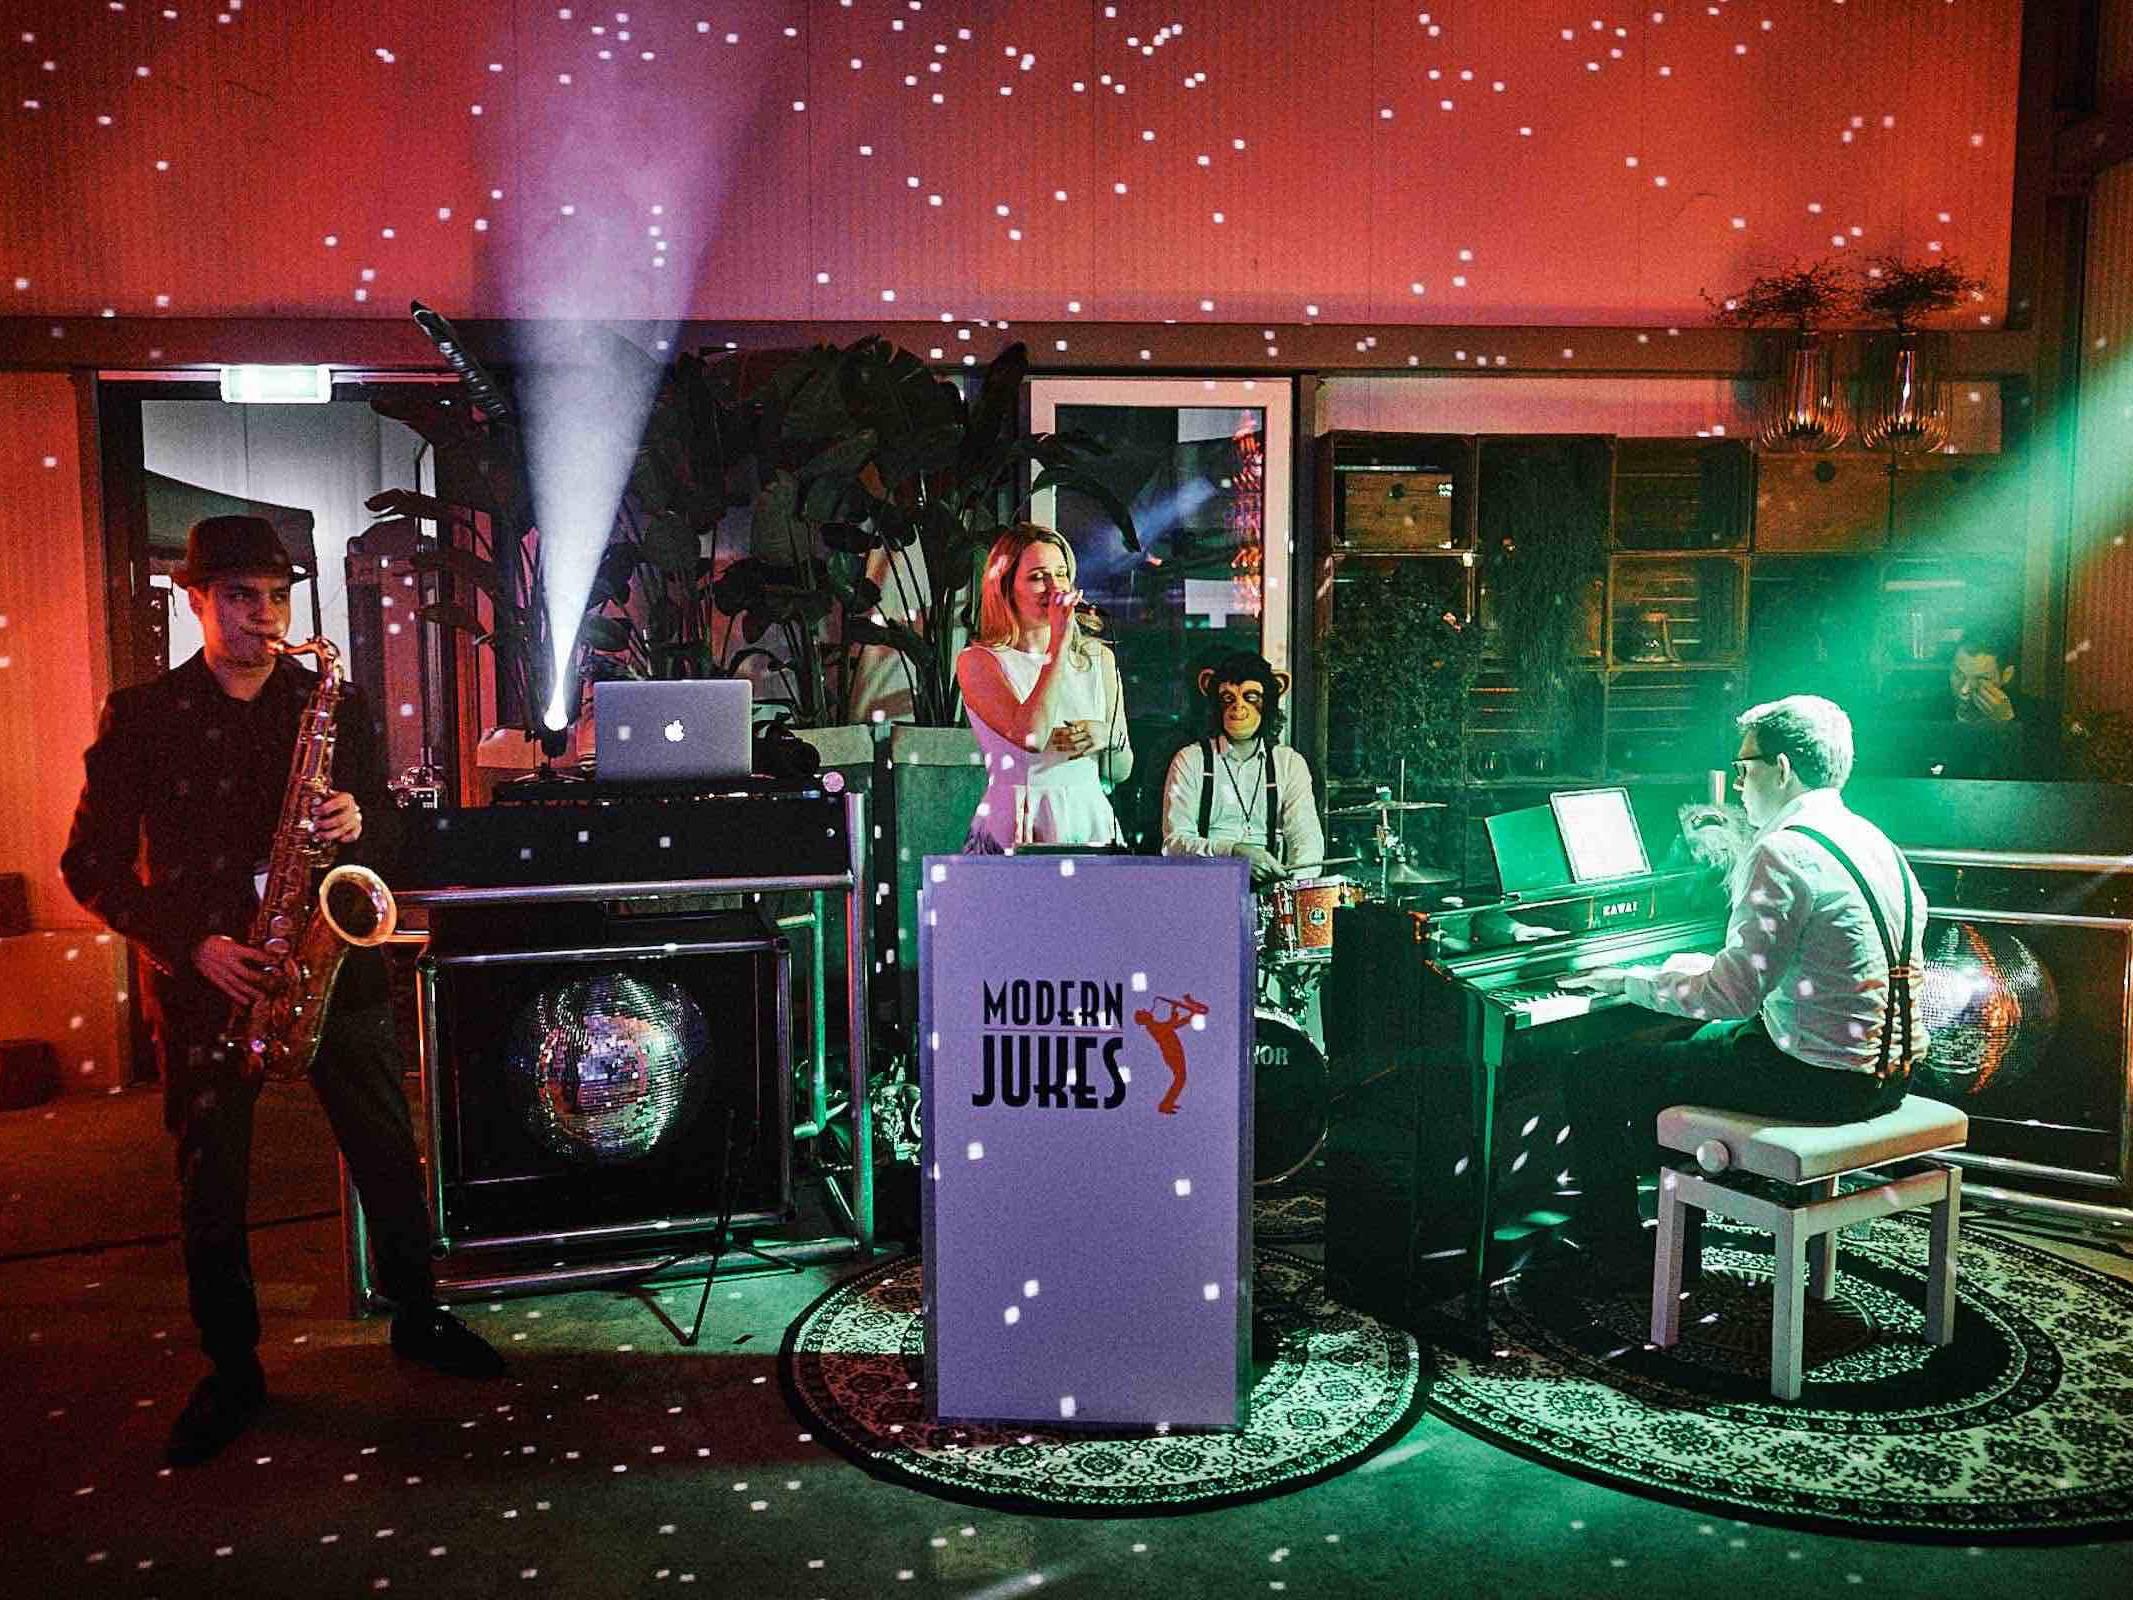 Band   Hamburg   Liveband   Livemusik   Partyband   Jazzband   Swingband   Lounge   Hochzeitsband   Popband   Jazz   Motown   Soul   Hochzeit   Messe   Firmenfeier   Charity   Gala   Buchen   Mieten   Anfragen   Hamburgfeiert